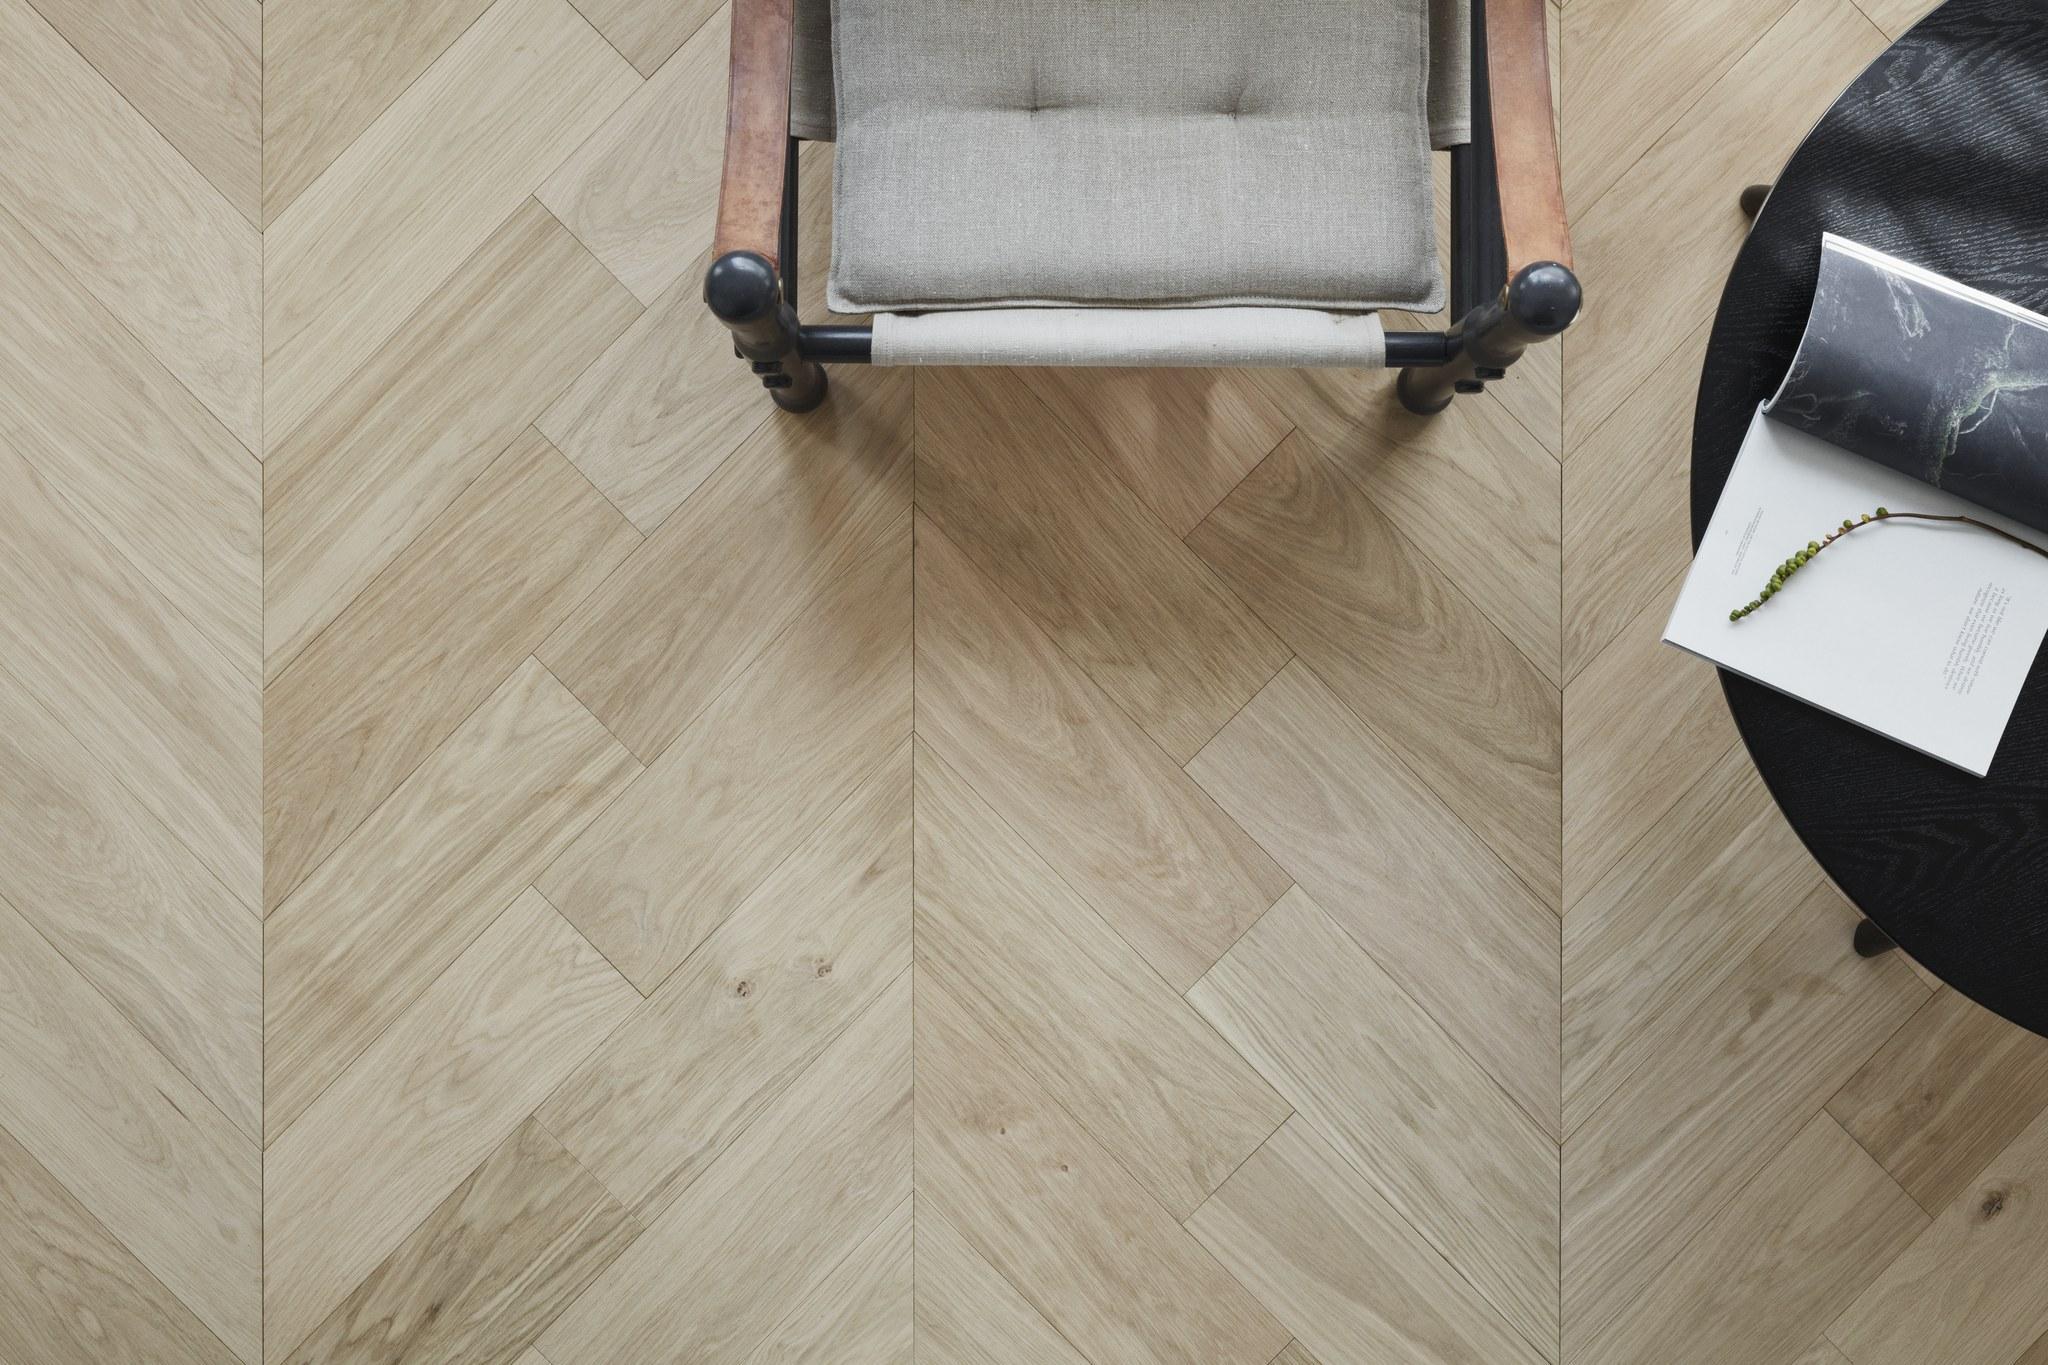 Timberwise Tammi Oak Design Floor Pala Chevron Vaaka